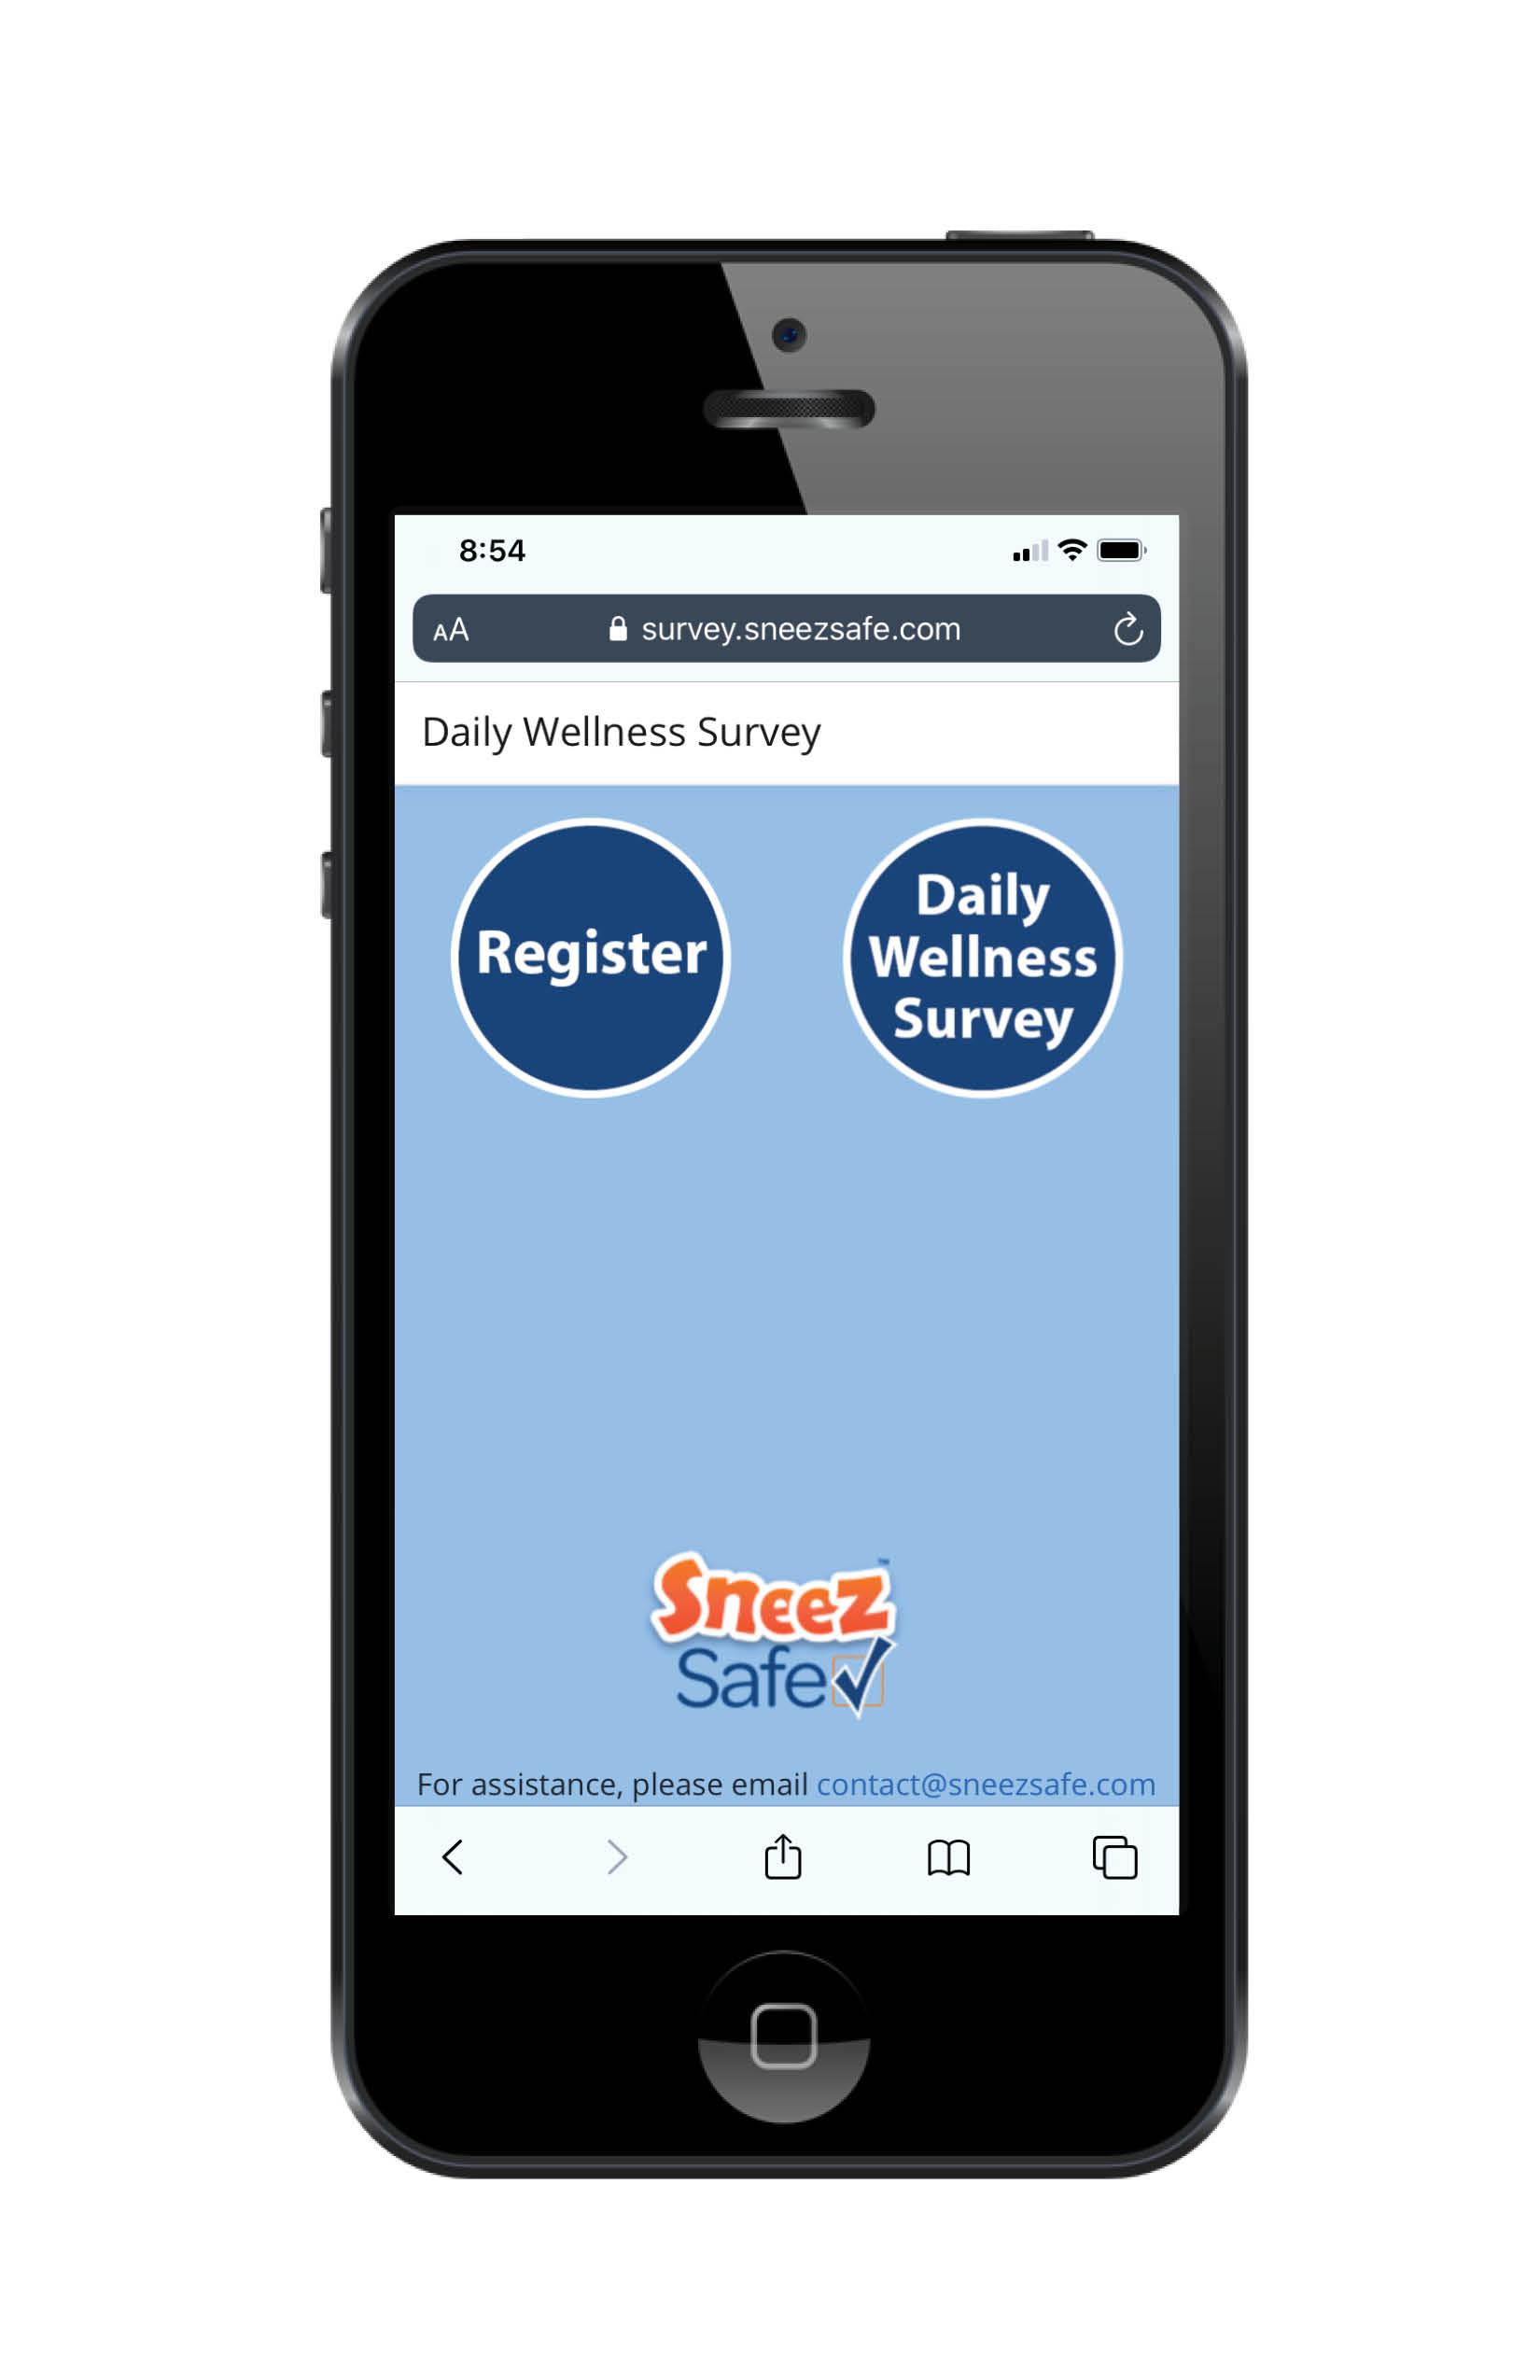 SneezSafe phone screen